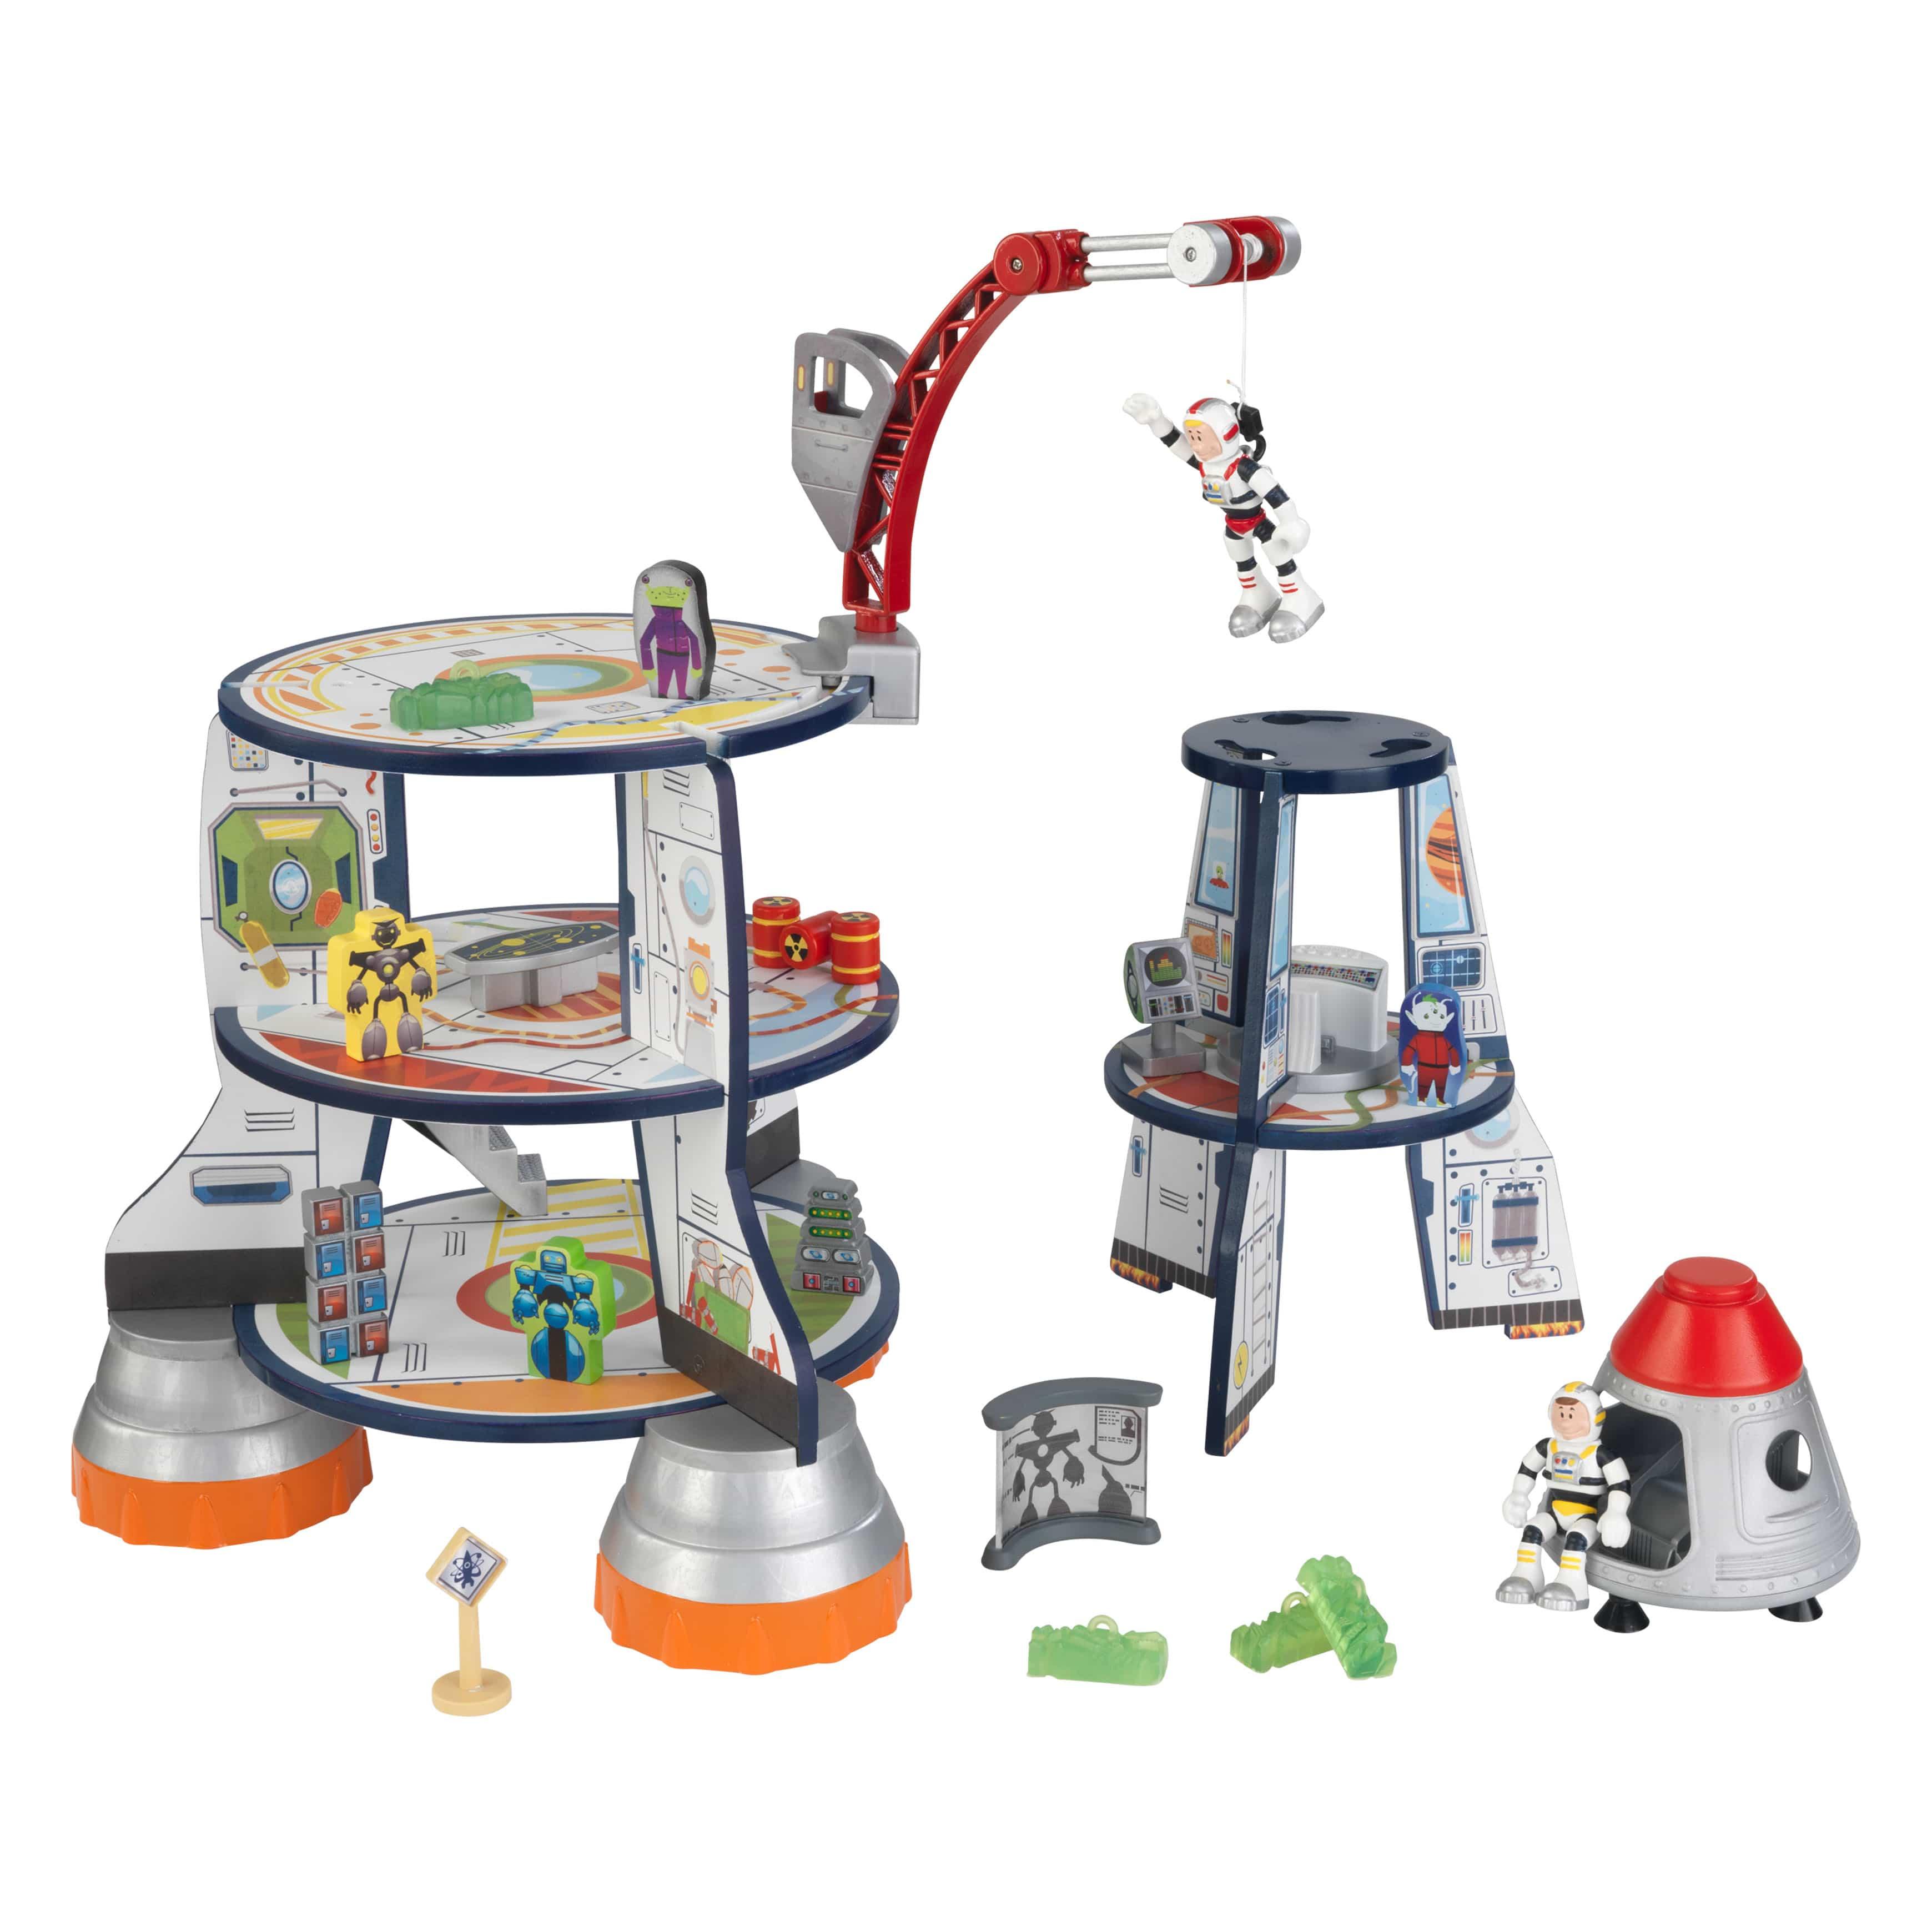 KidKraft - дървена играчка за момчета - Космическа ракета(3)-bellamie